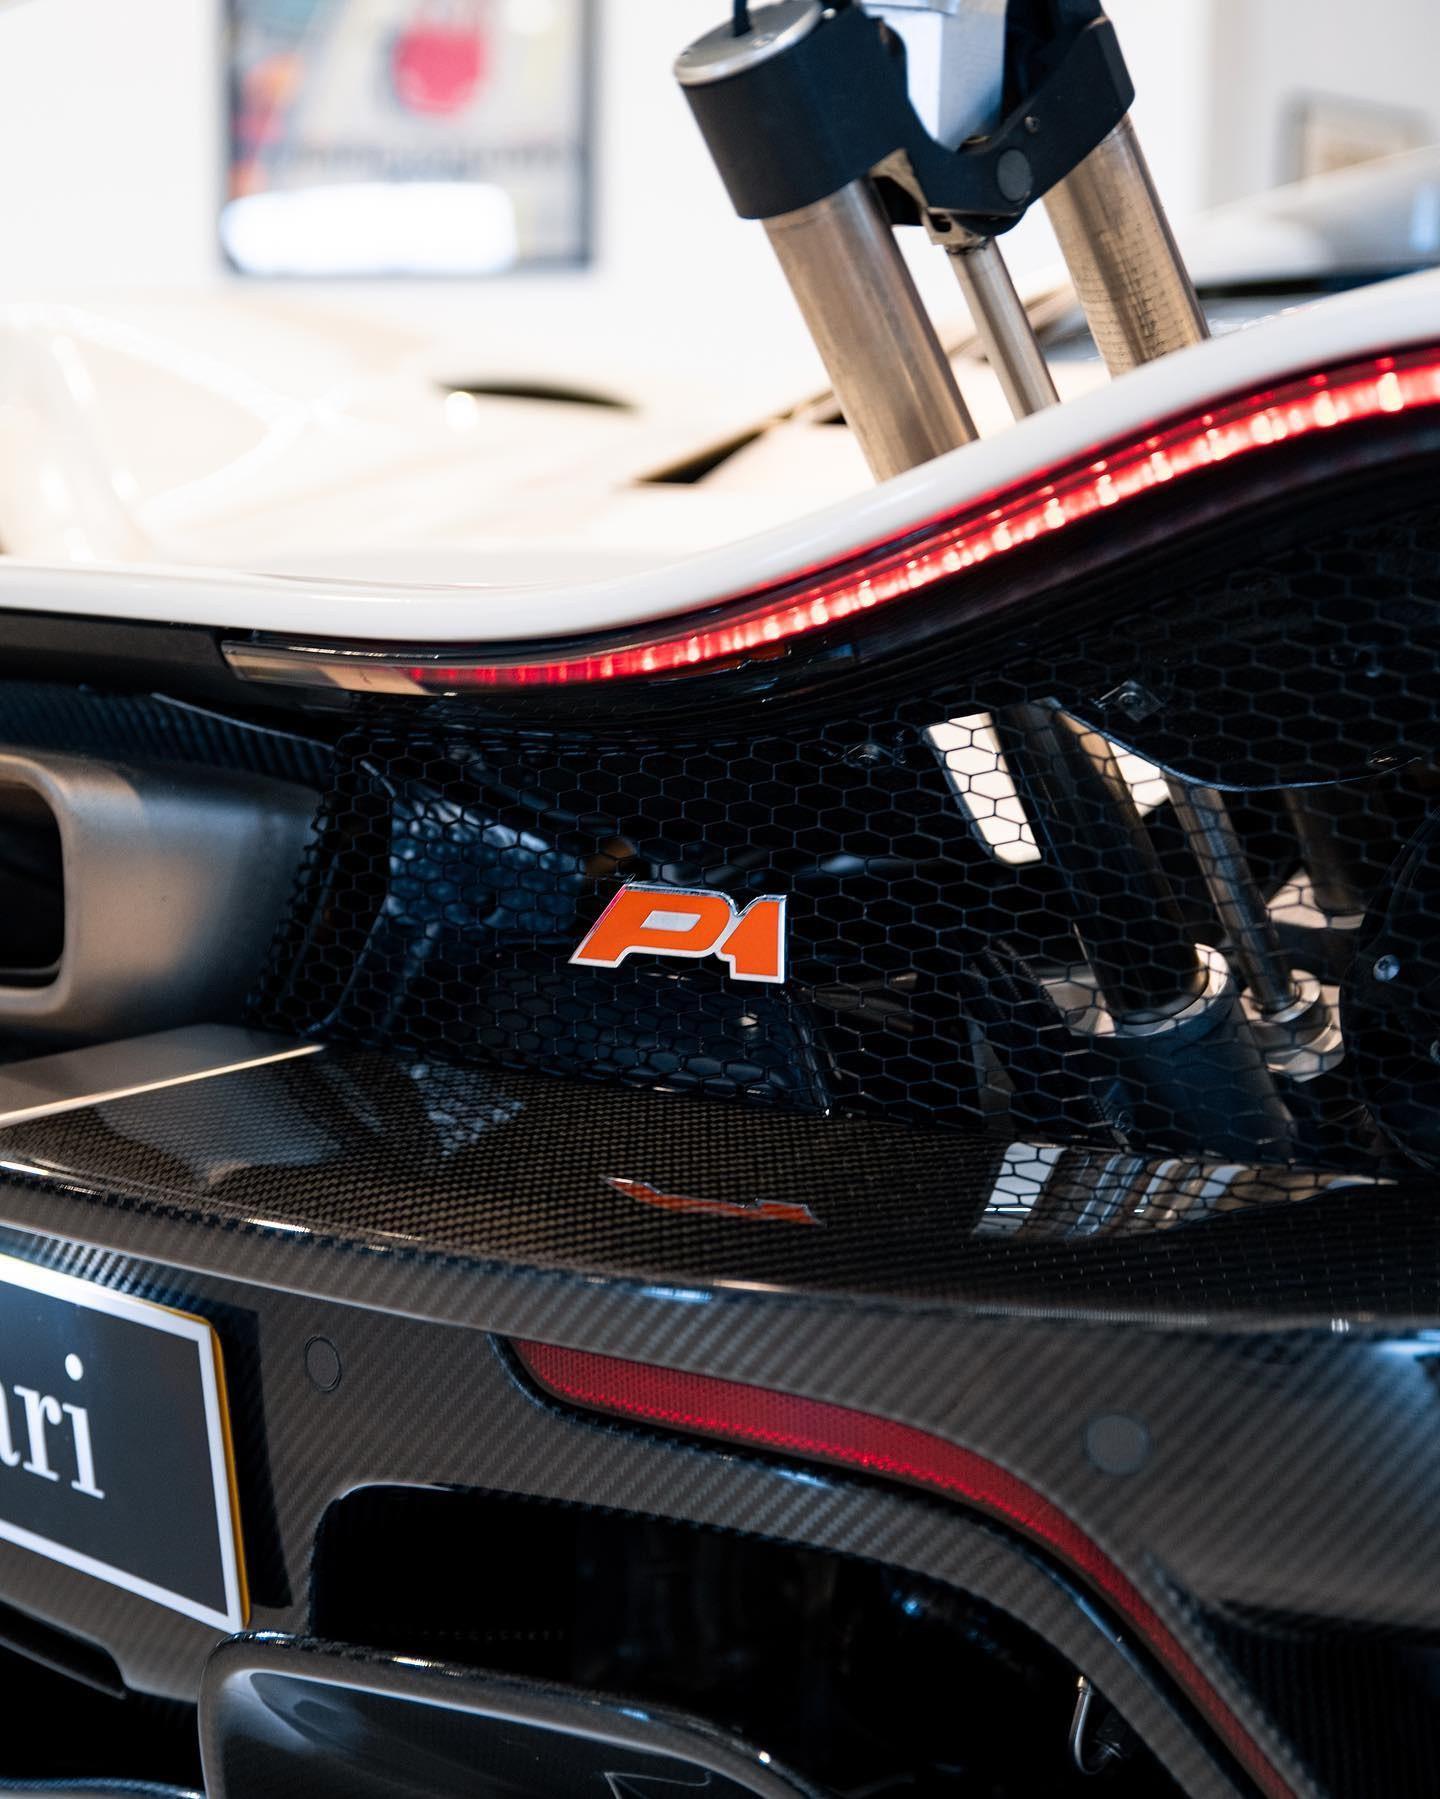 2013_McLaren_P1_sale-0003